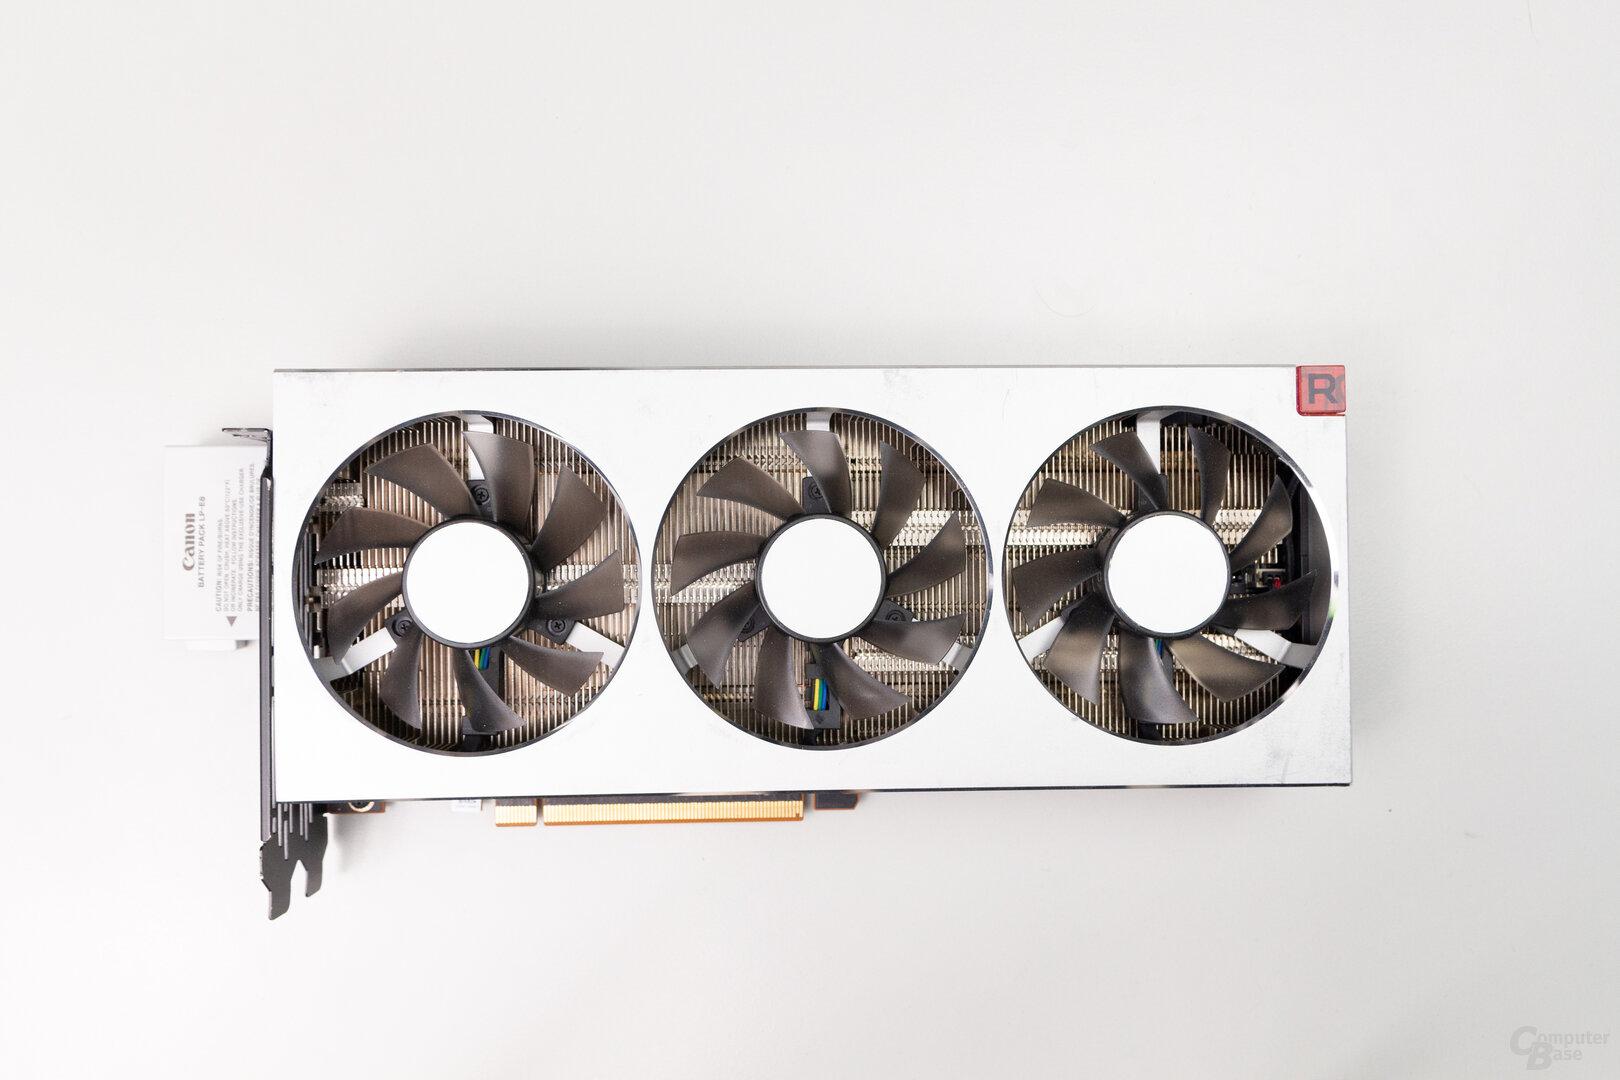 Radeon VII: 27,0 cm